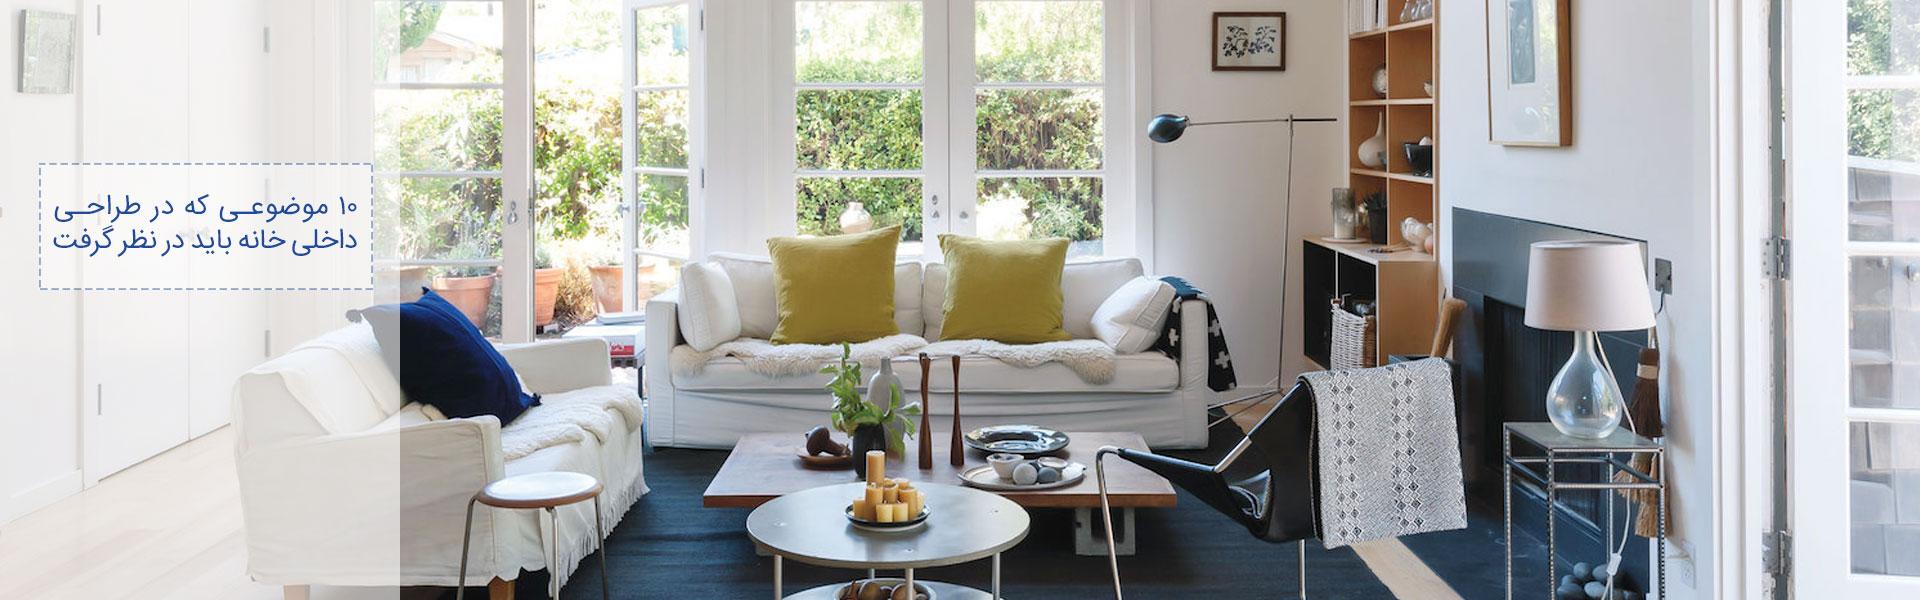 10 mozoo tarahidakheli1 - ۱۰ موضوعی که در طراحی داخلی خانه باید در نظر گرفت